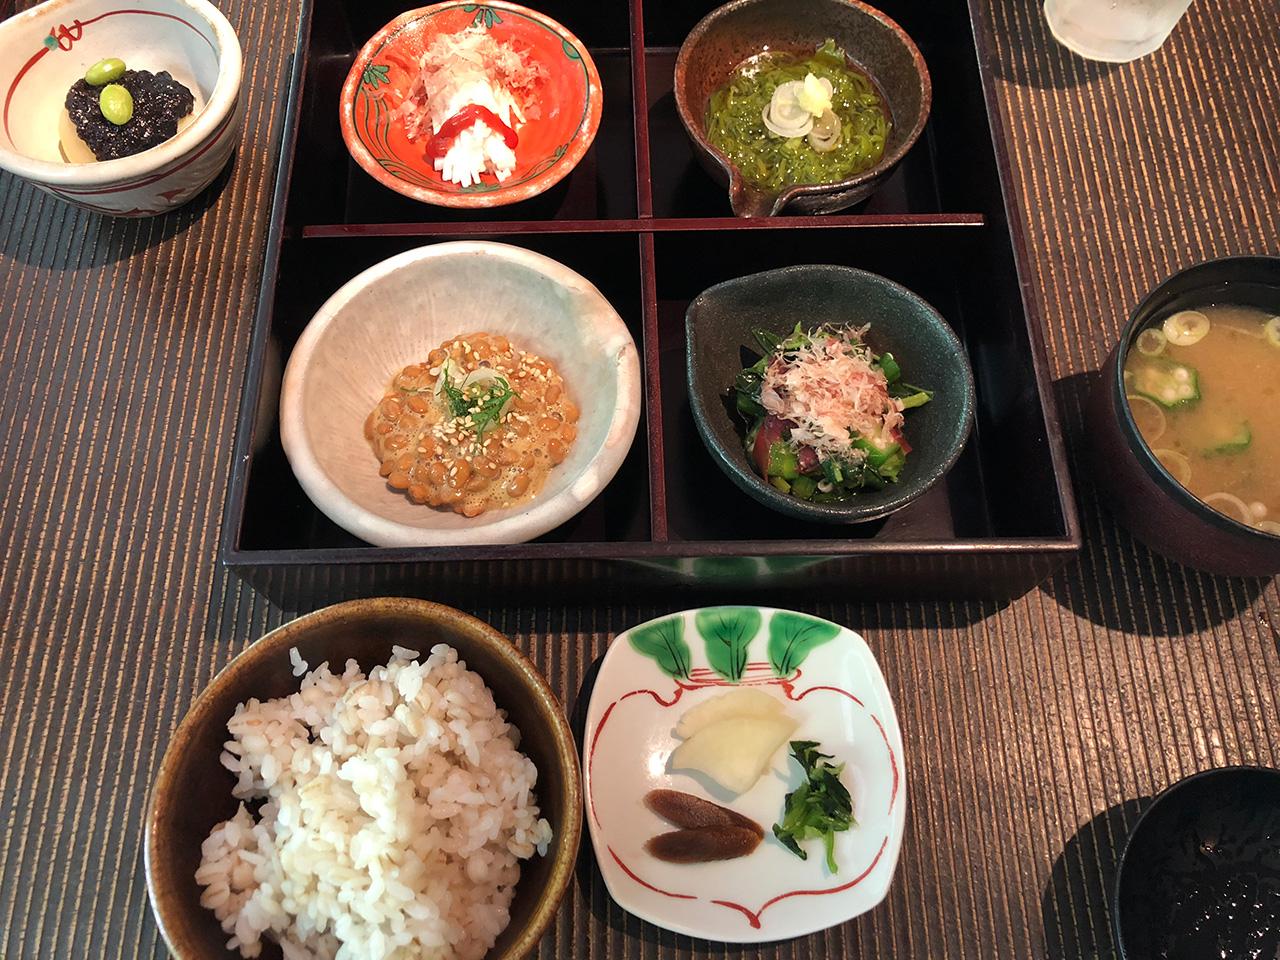 箱根湯本温泉〈天山湯治郷〉の食事処「山法師」の料理